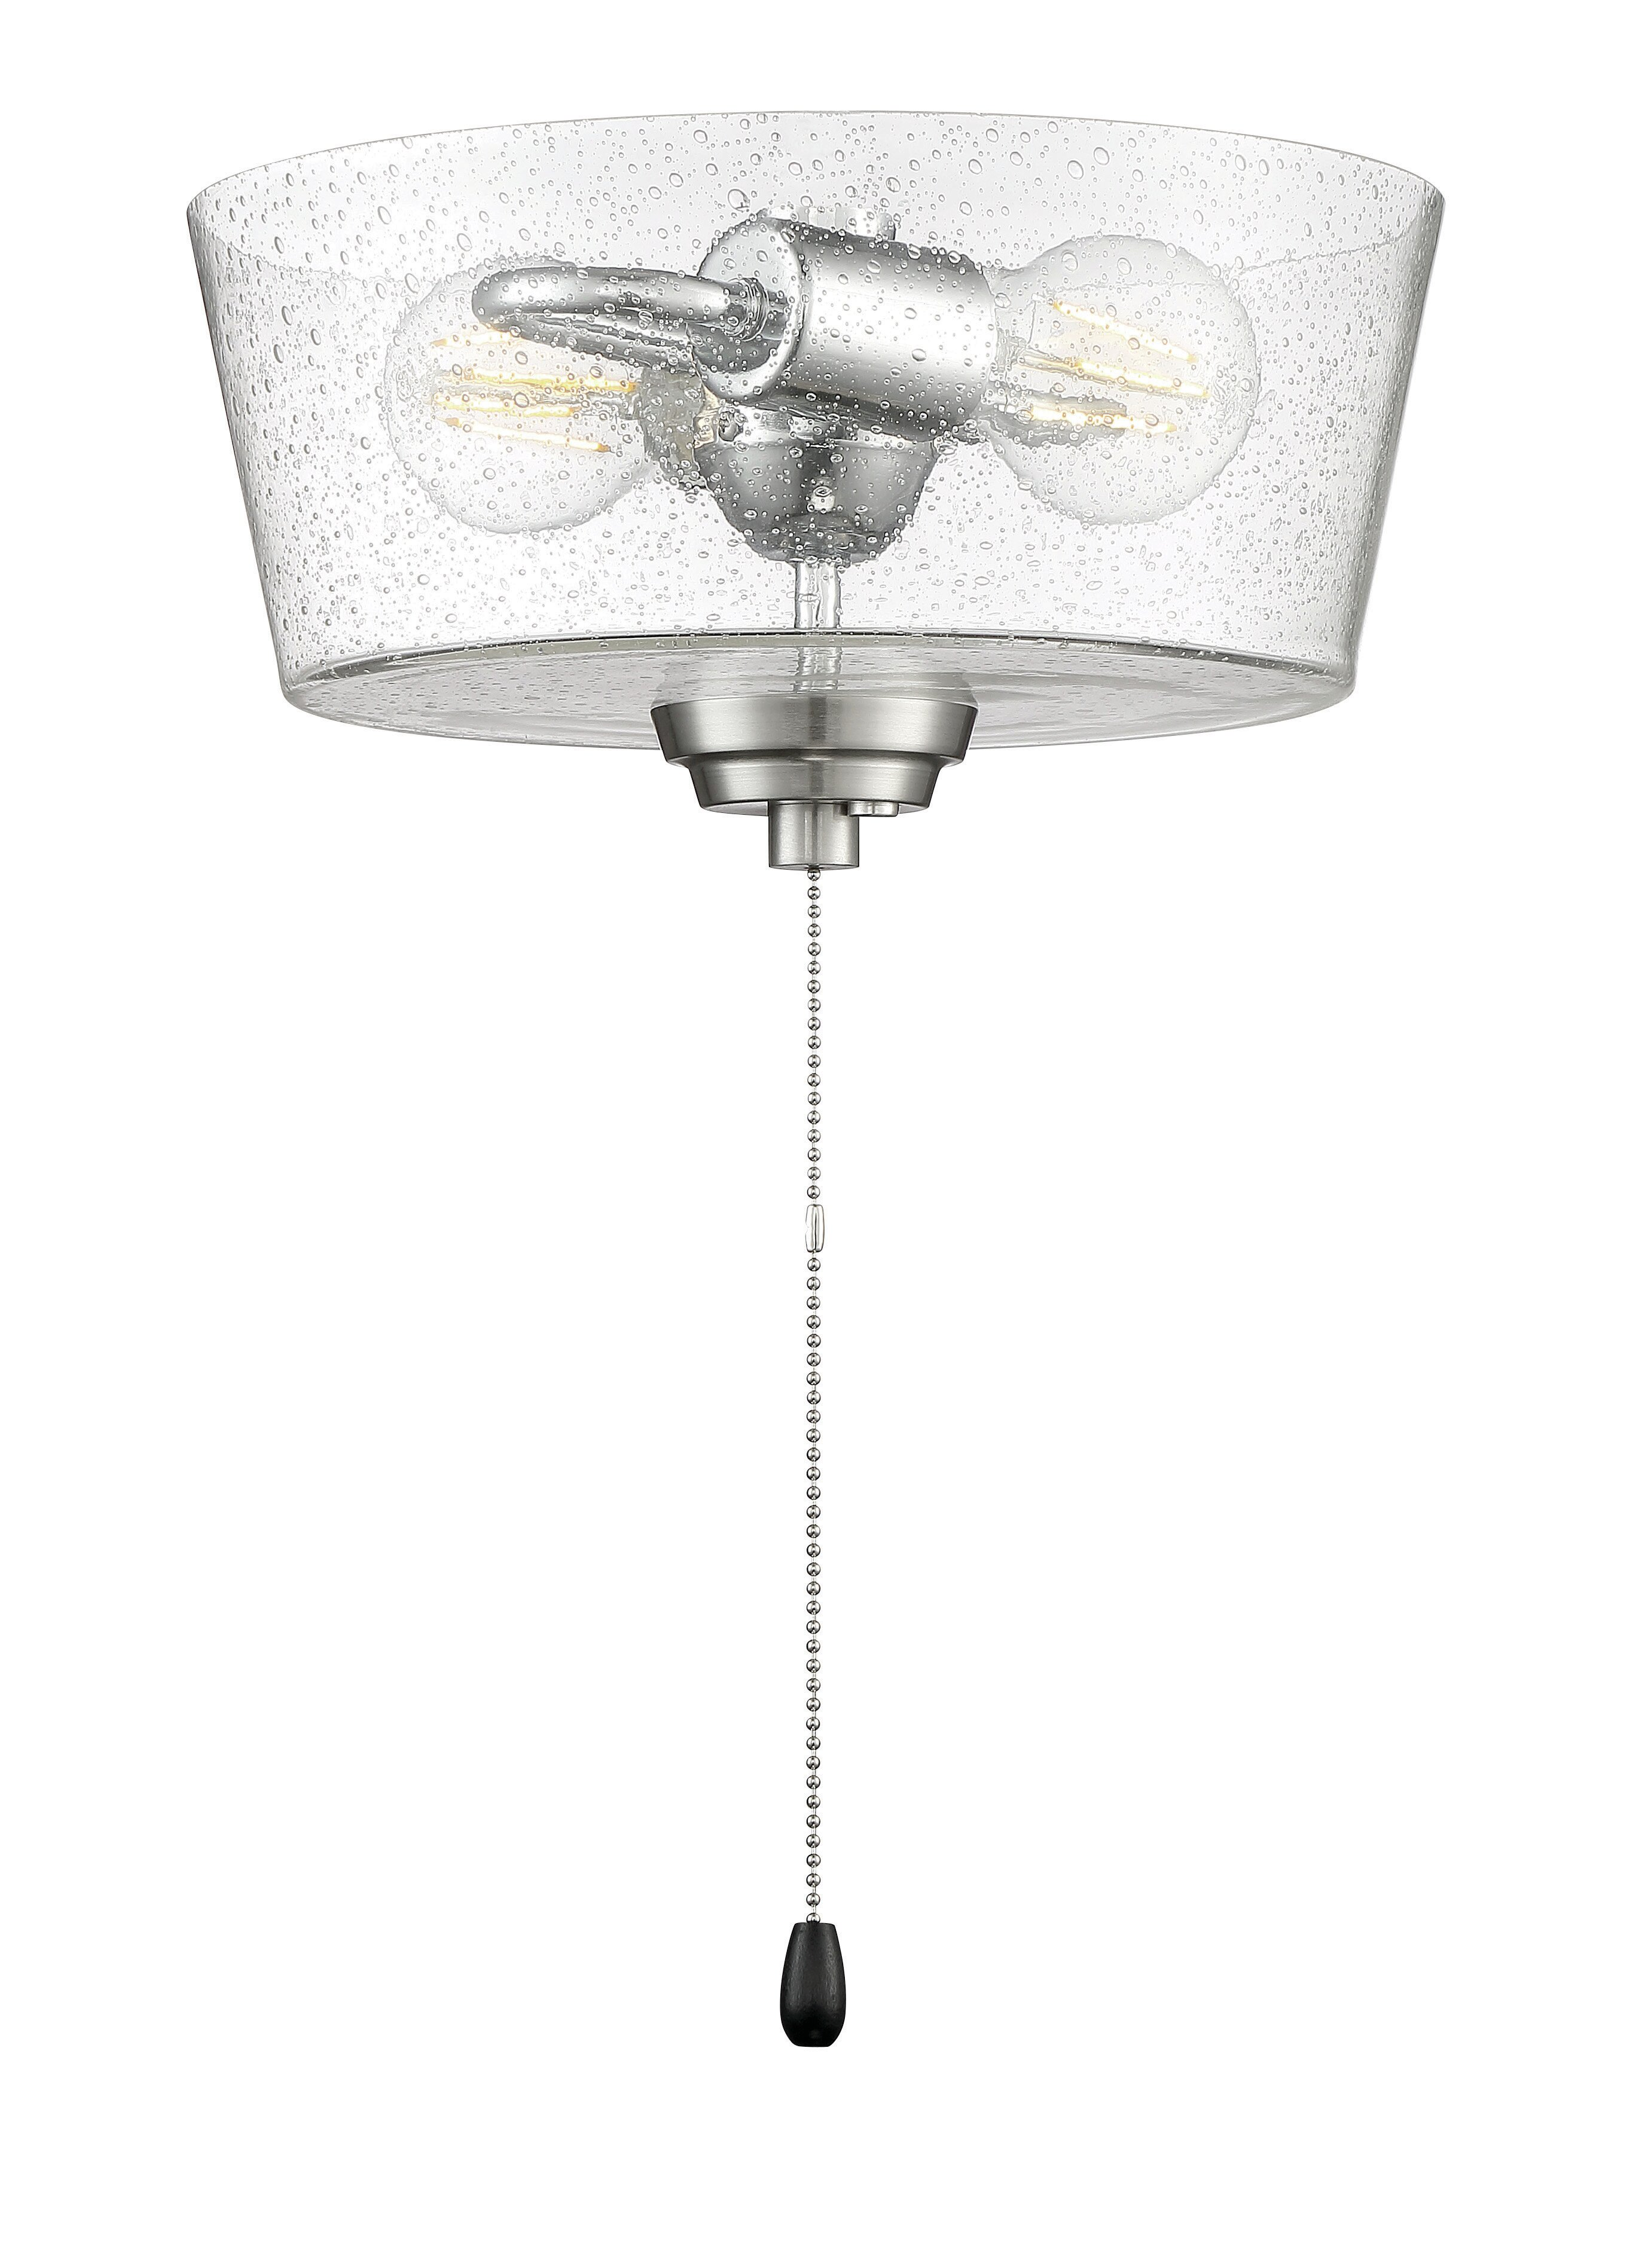 Breakwater Bay 2 Light Universal Ceiling Fan Bowl Light Kit Reviews Wayfair